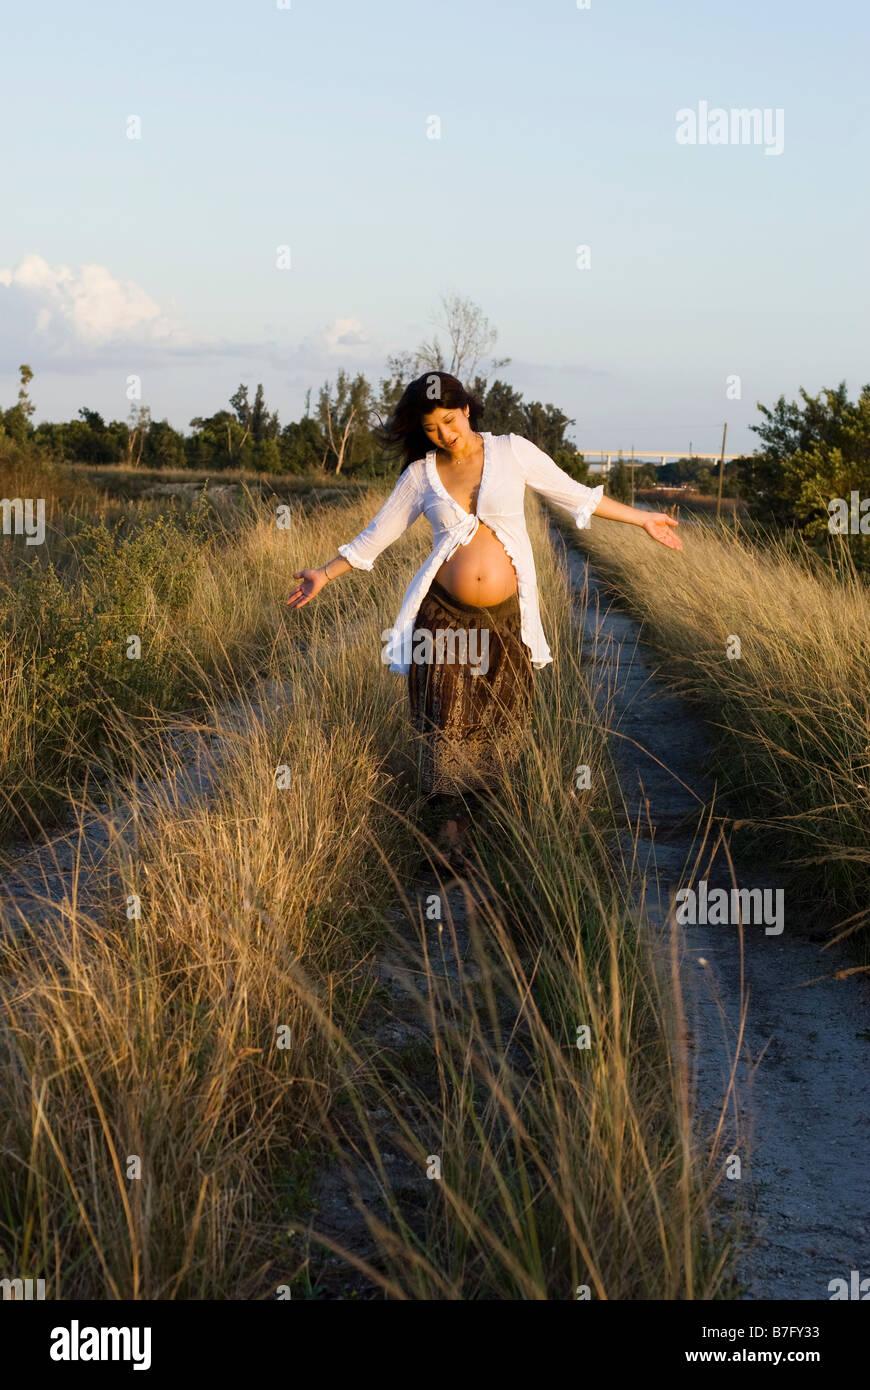 Prenatal Shoot in Everglades, lifestyle portrait - Stock Image